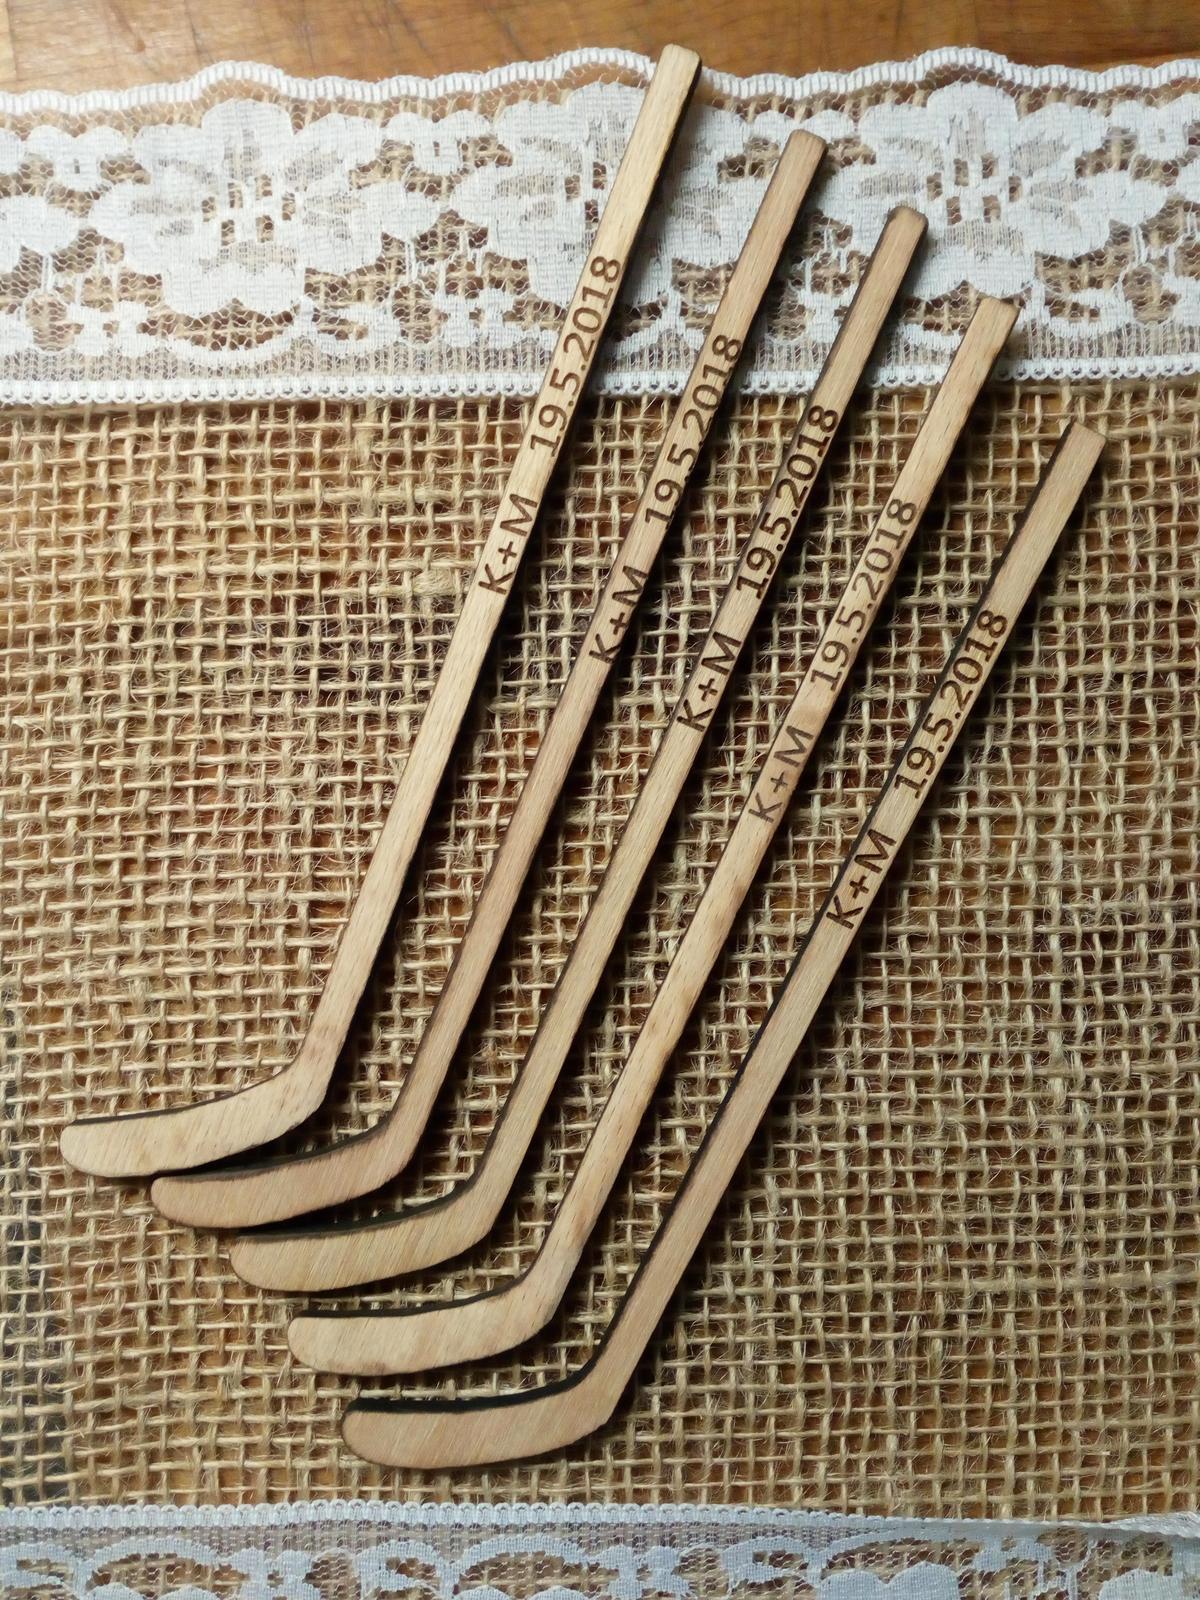 Jmenovka hokejka, dekorace na hokejovou svatbu - Obrázek č. 2